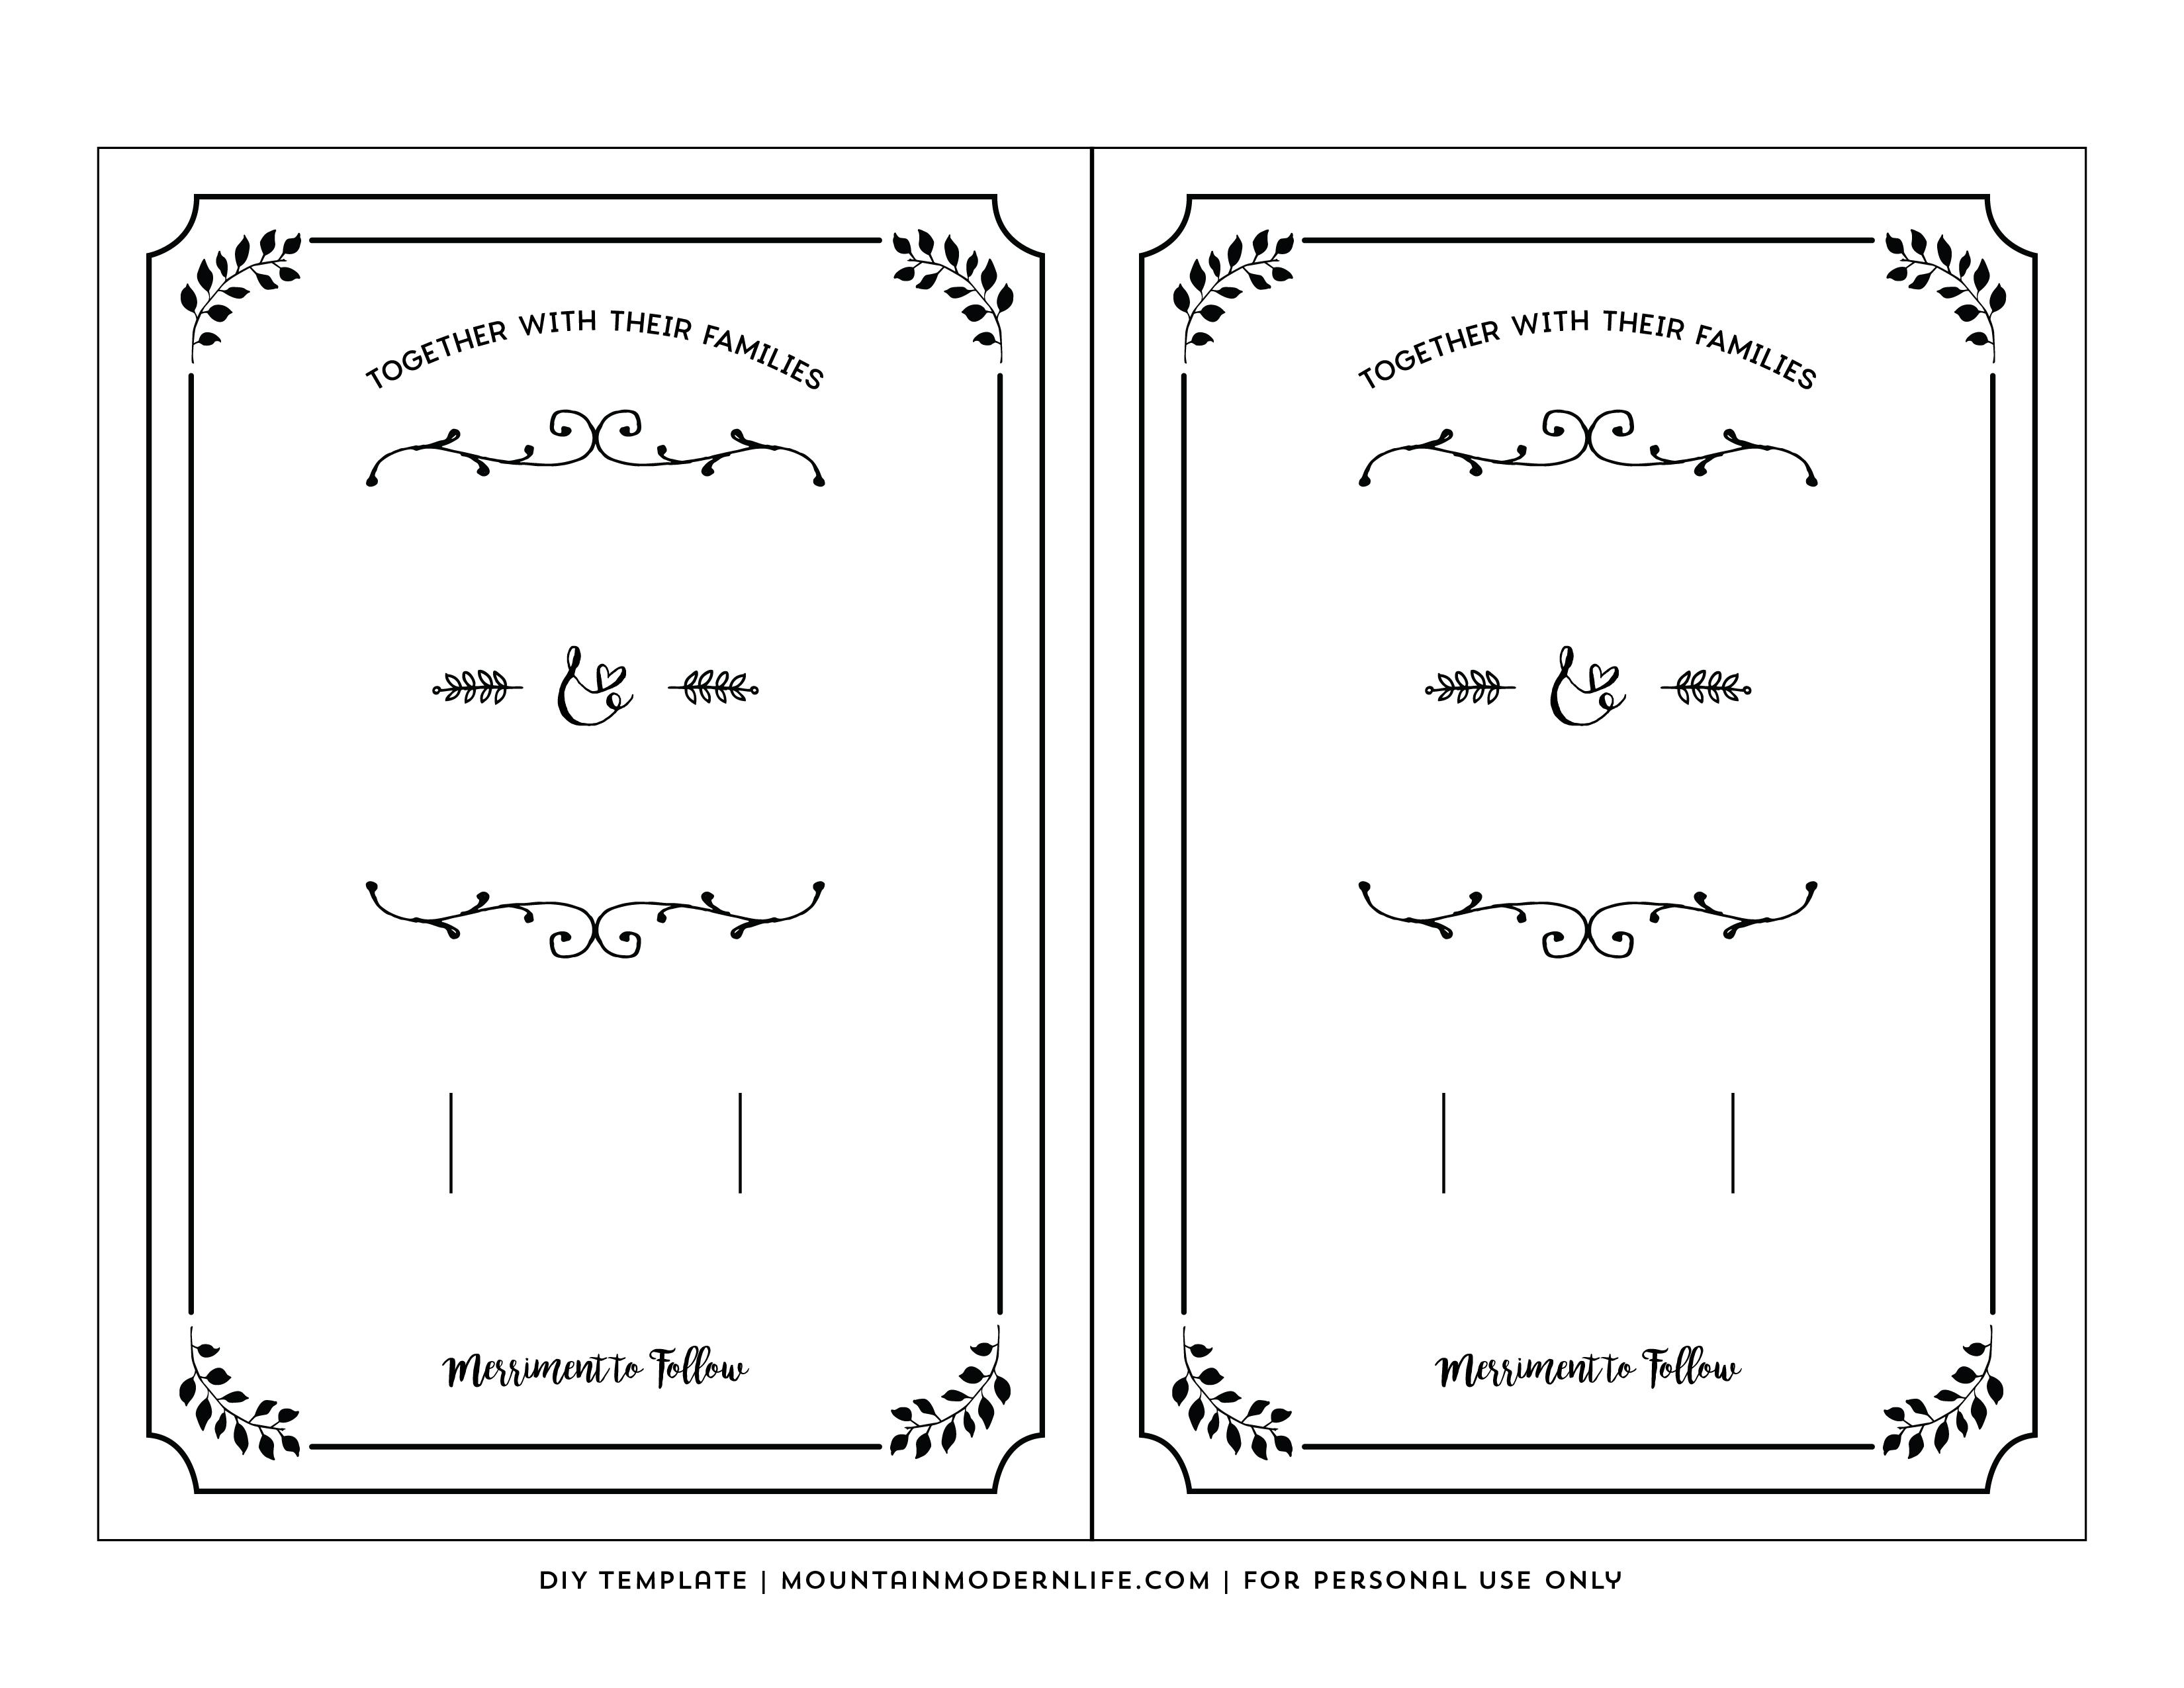 Free Printable Wedding Invitation Template - Free Printable Wedding Invitation Templates